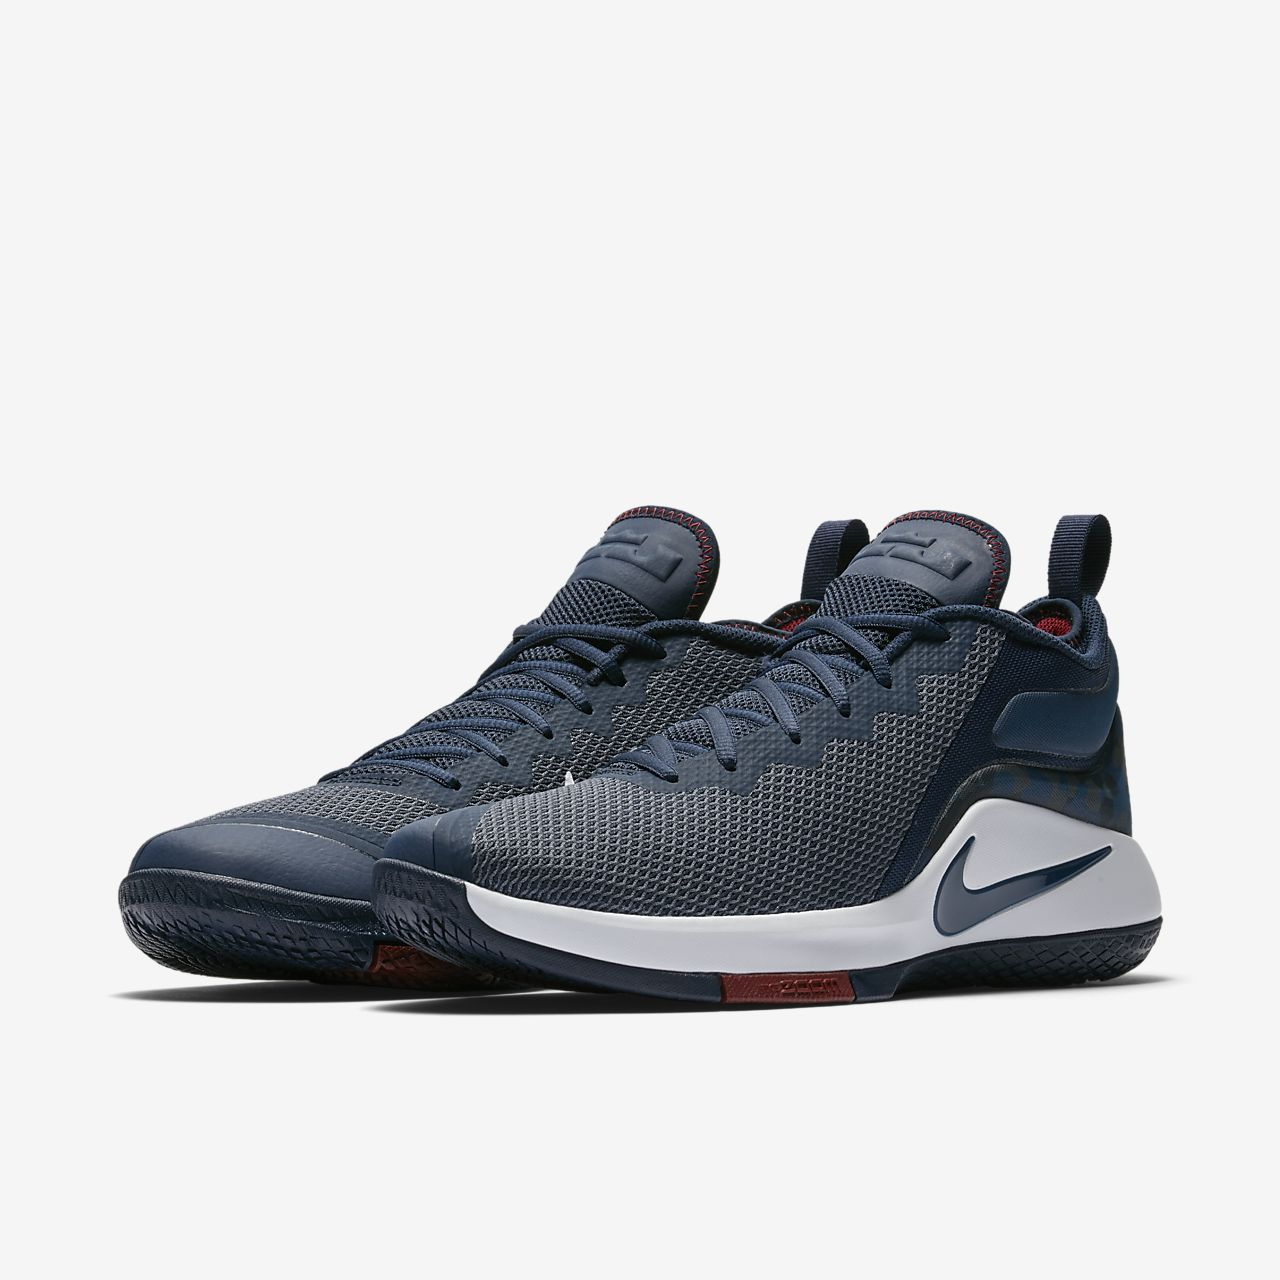 nike mens baseball molded nike basketball shoes price